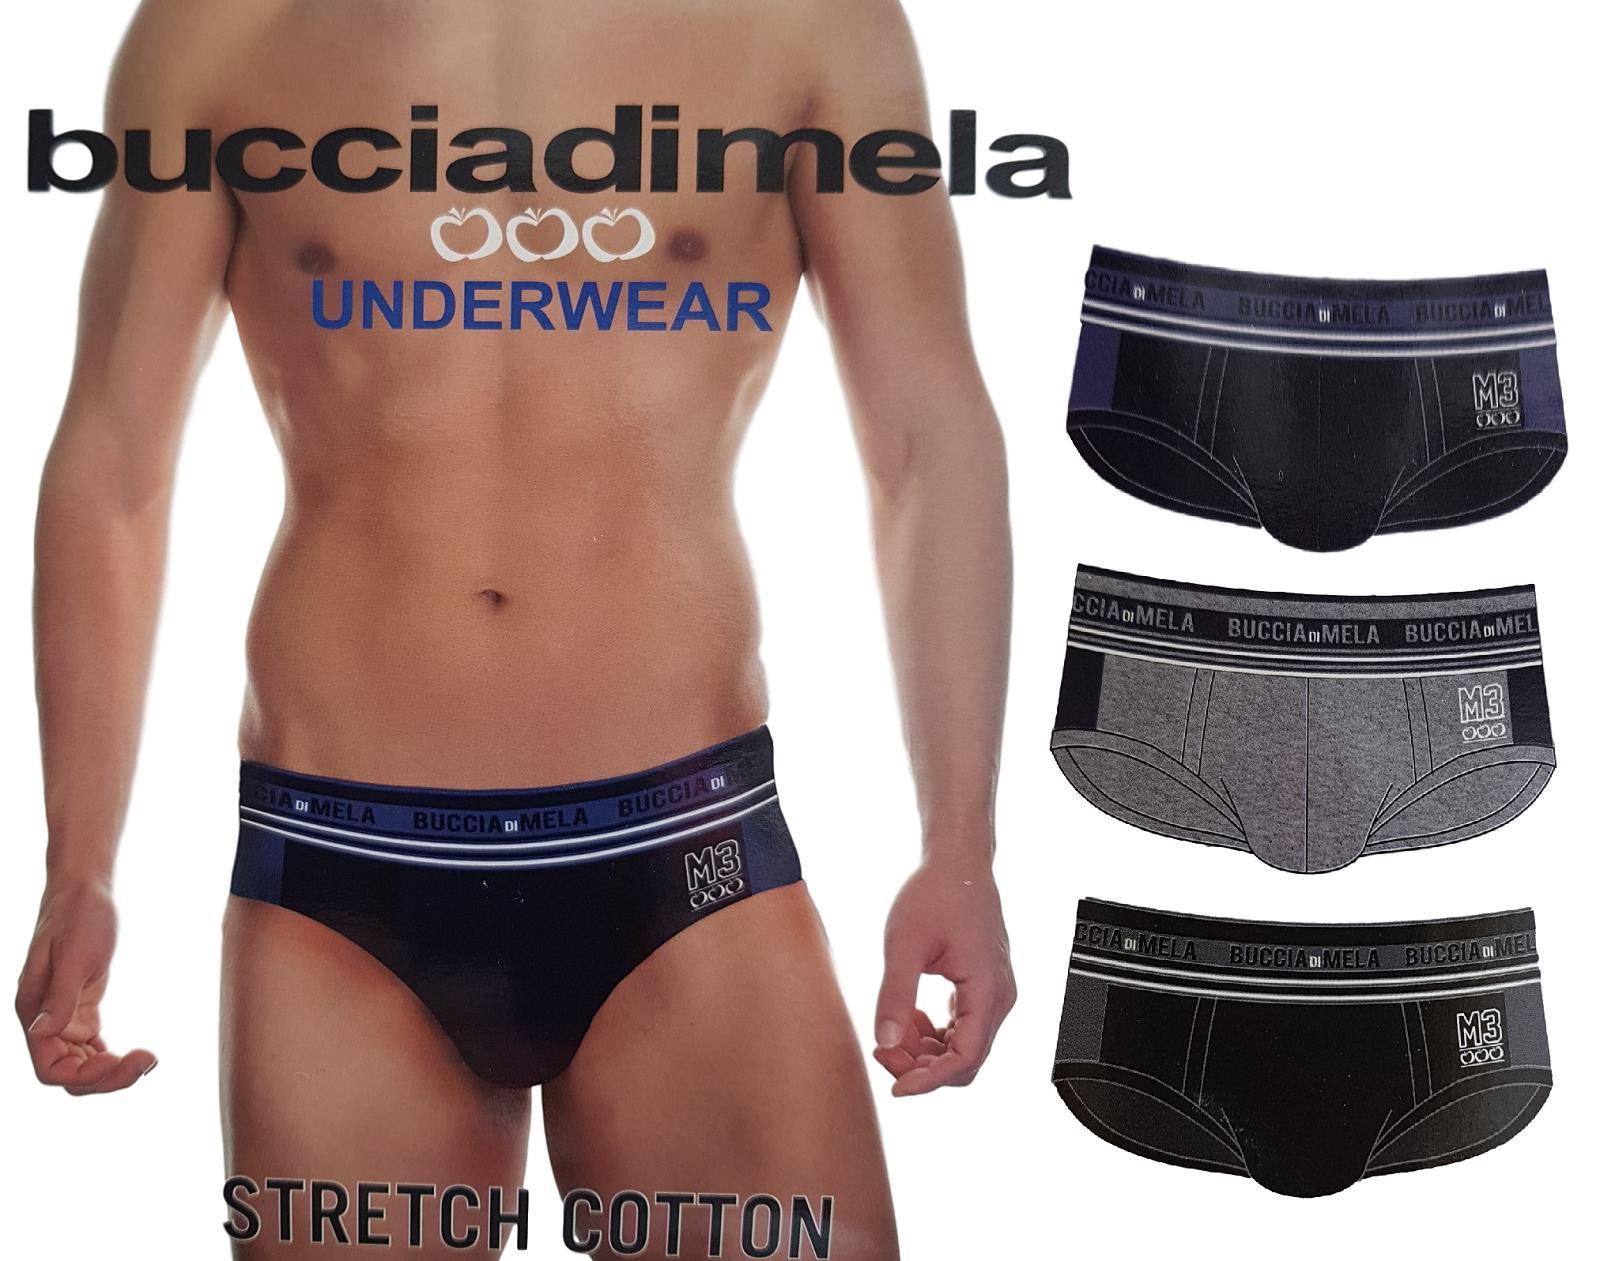 BUCCIADIMELA. 3x Slip uomo STRECH COTTON Underwear - S111. Grigio + Blu + Nero.